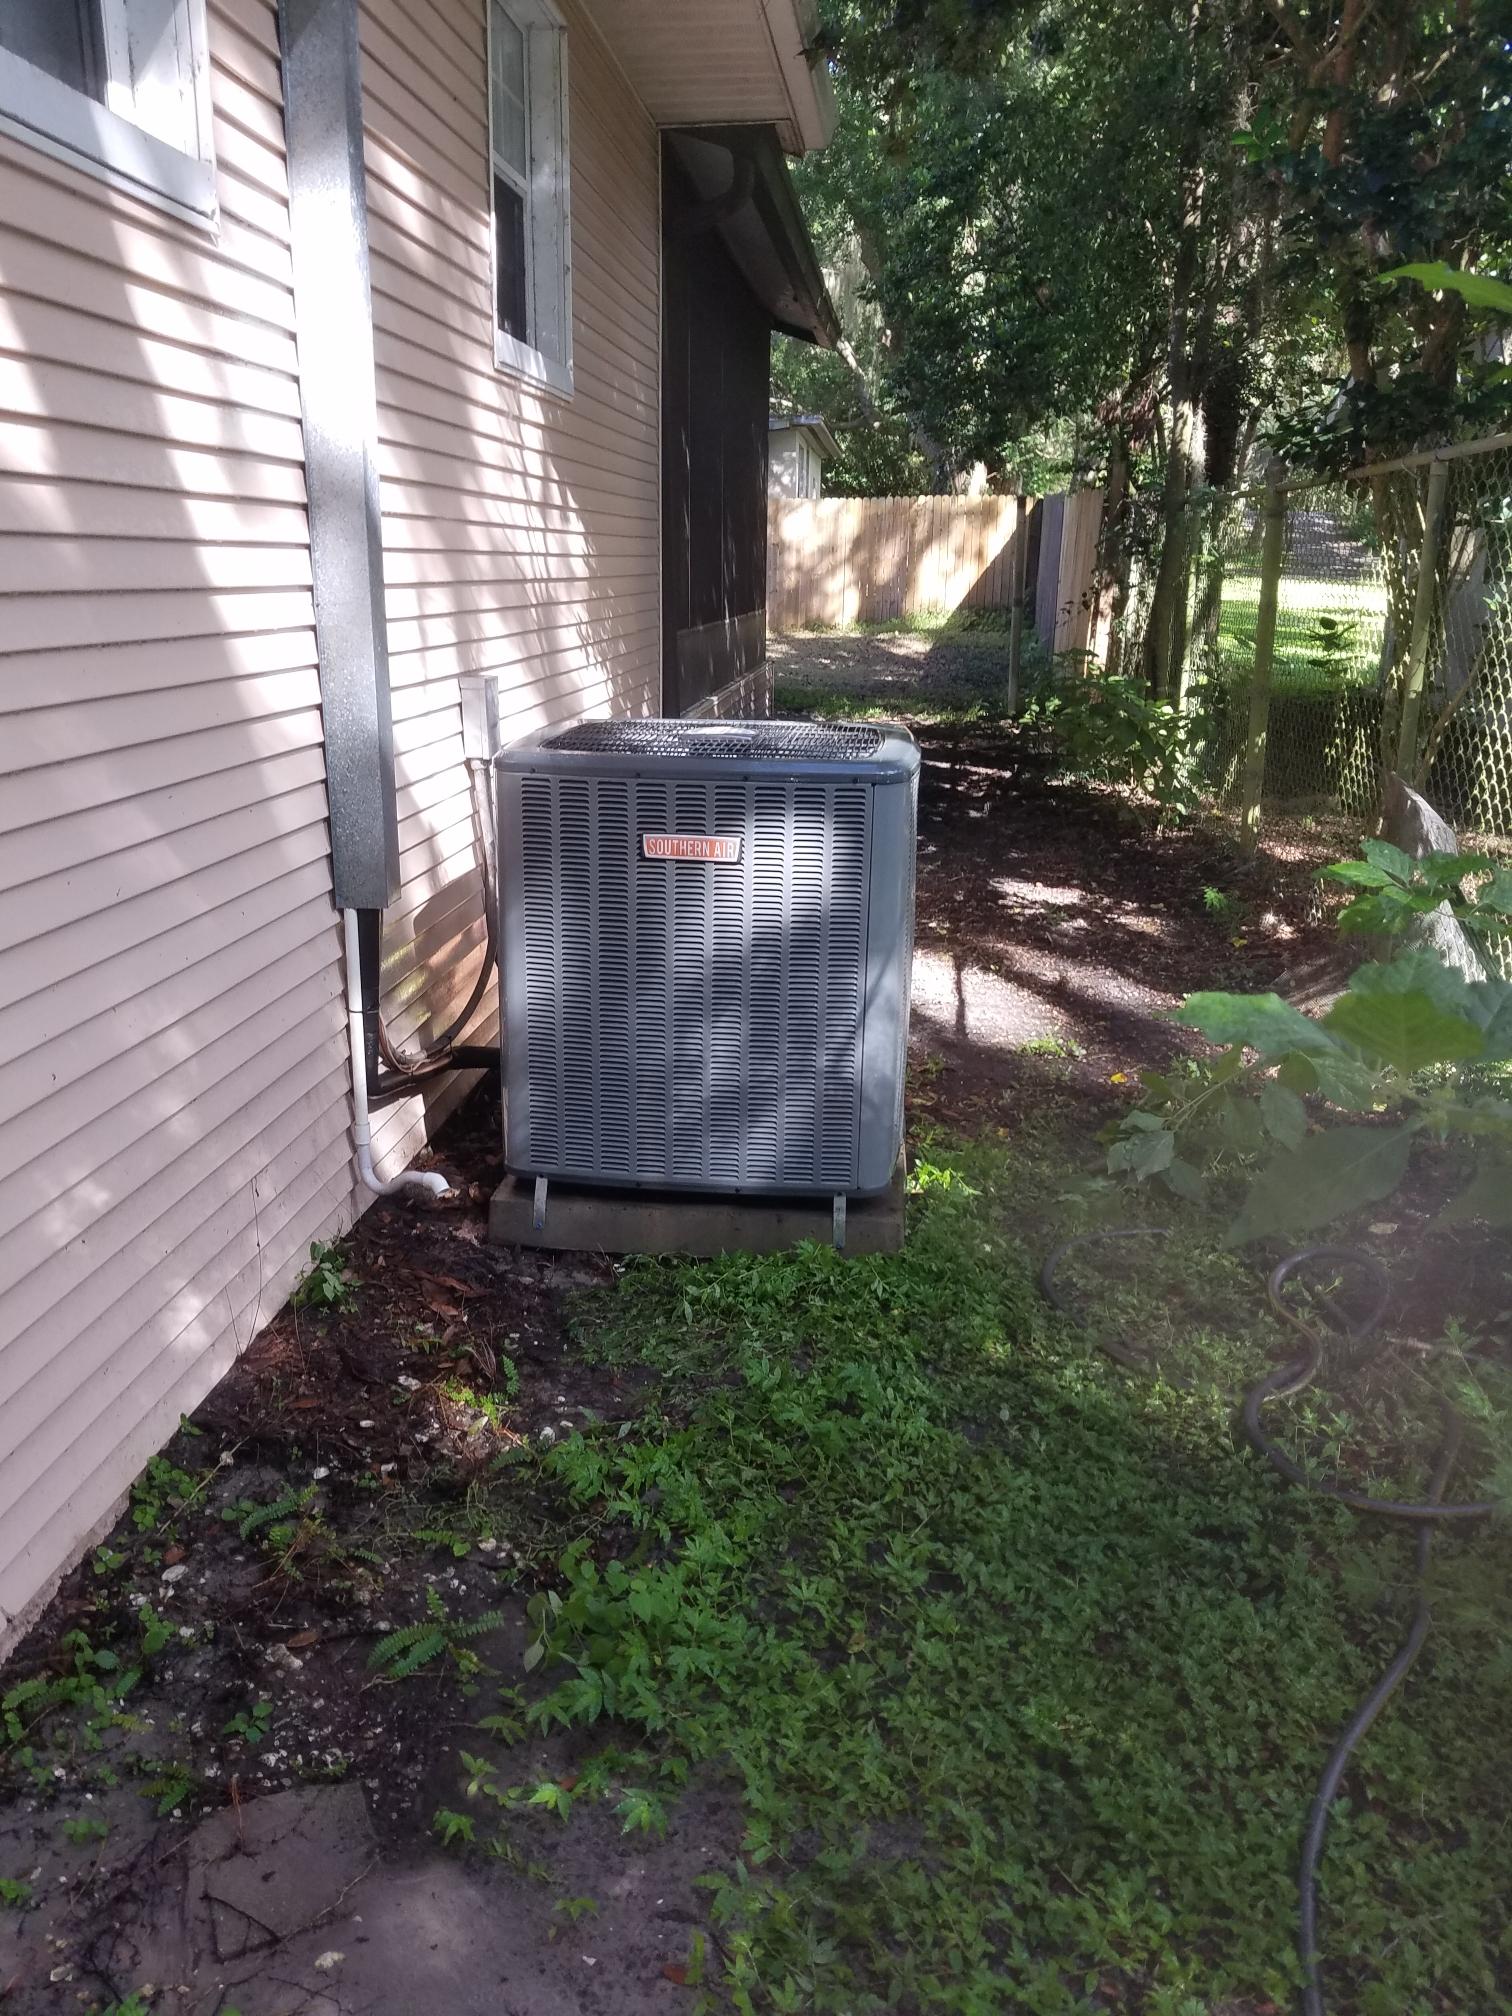 Keystone Heights, FL - Maintenance on amana